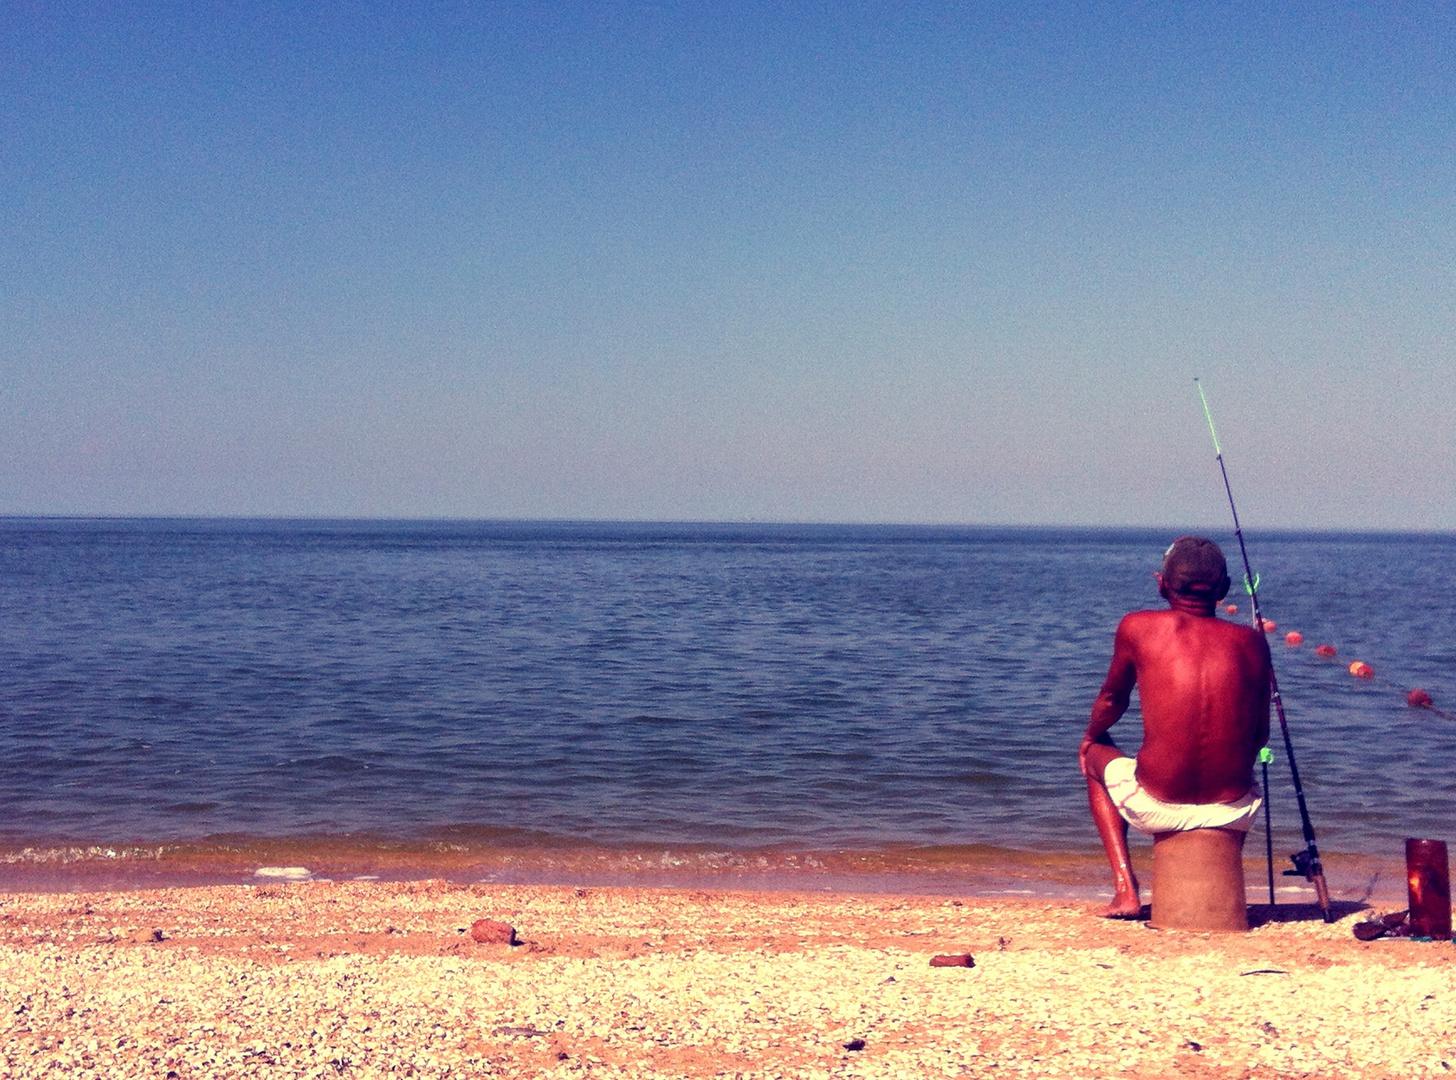 Angler am Meer 2